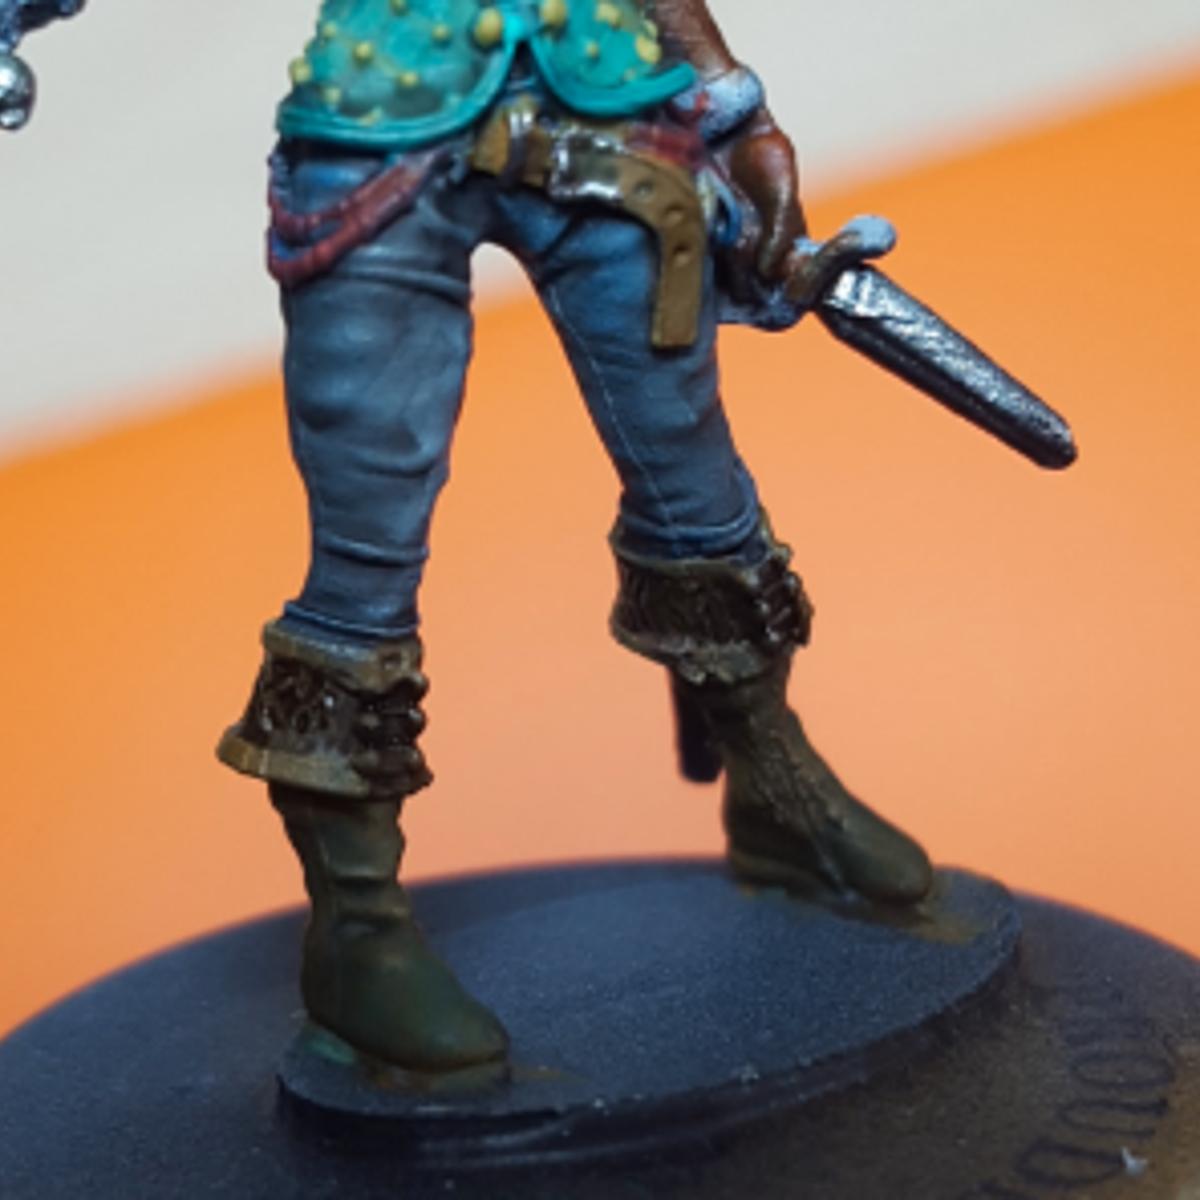 Trousers - Pirate captain (Efficool miniatures)